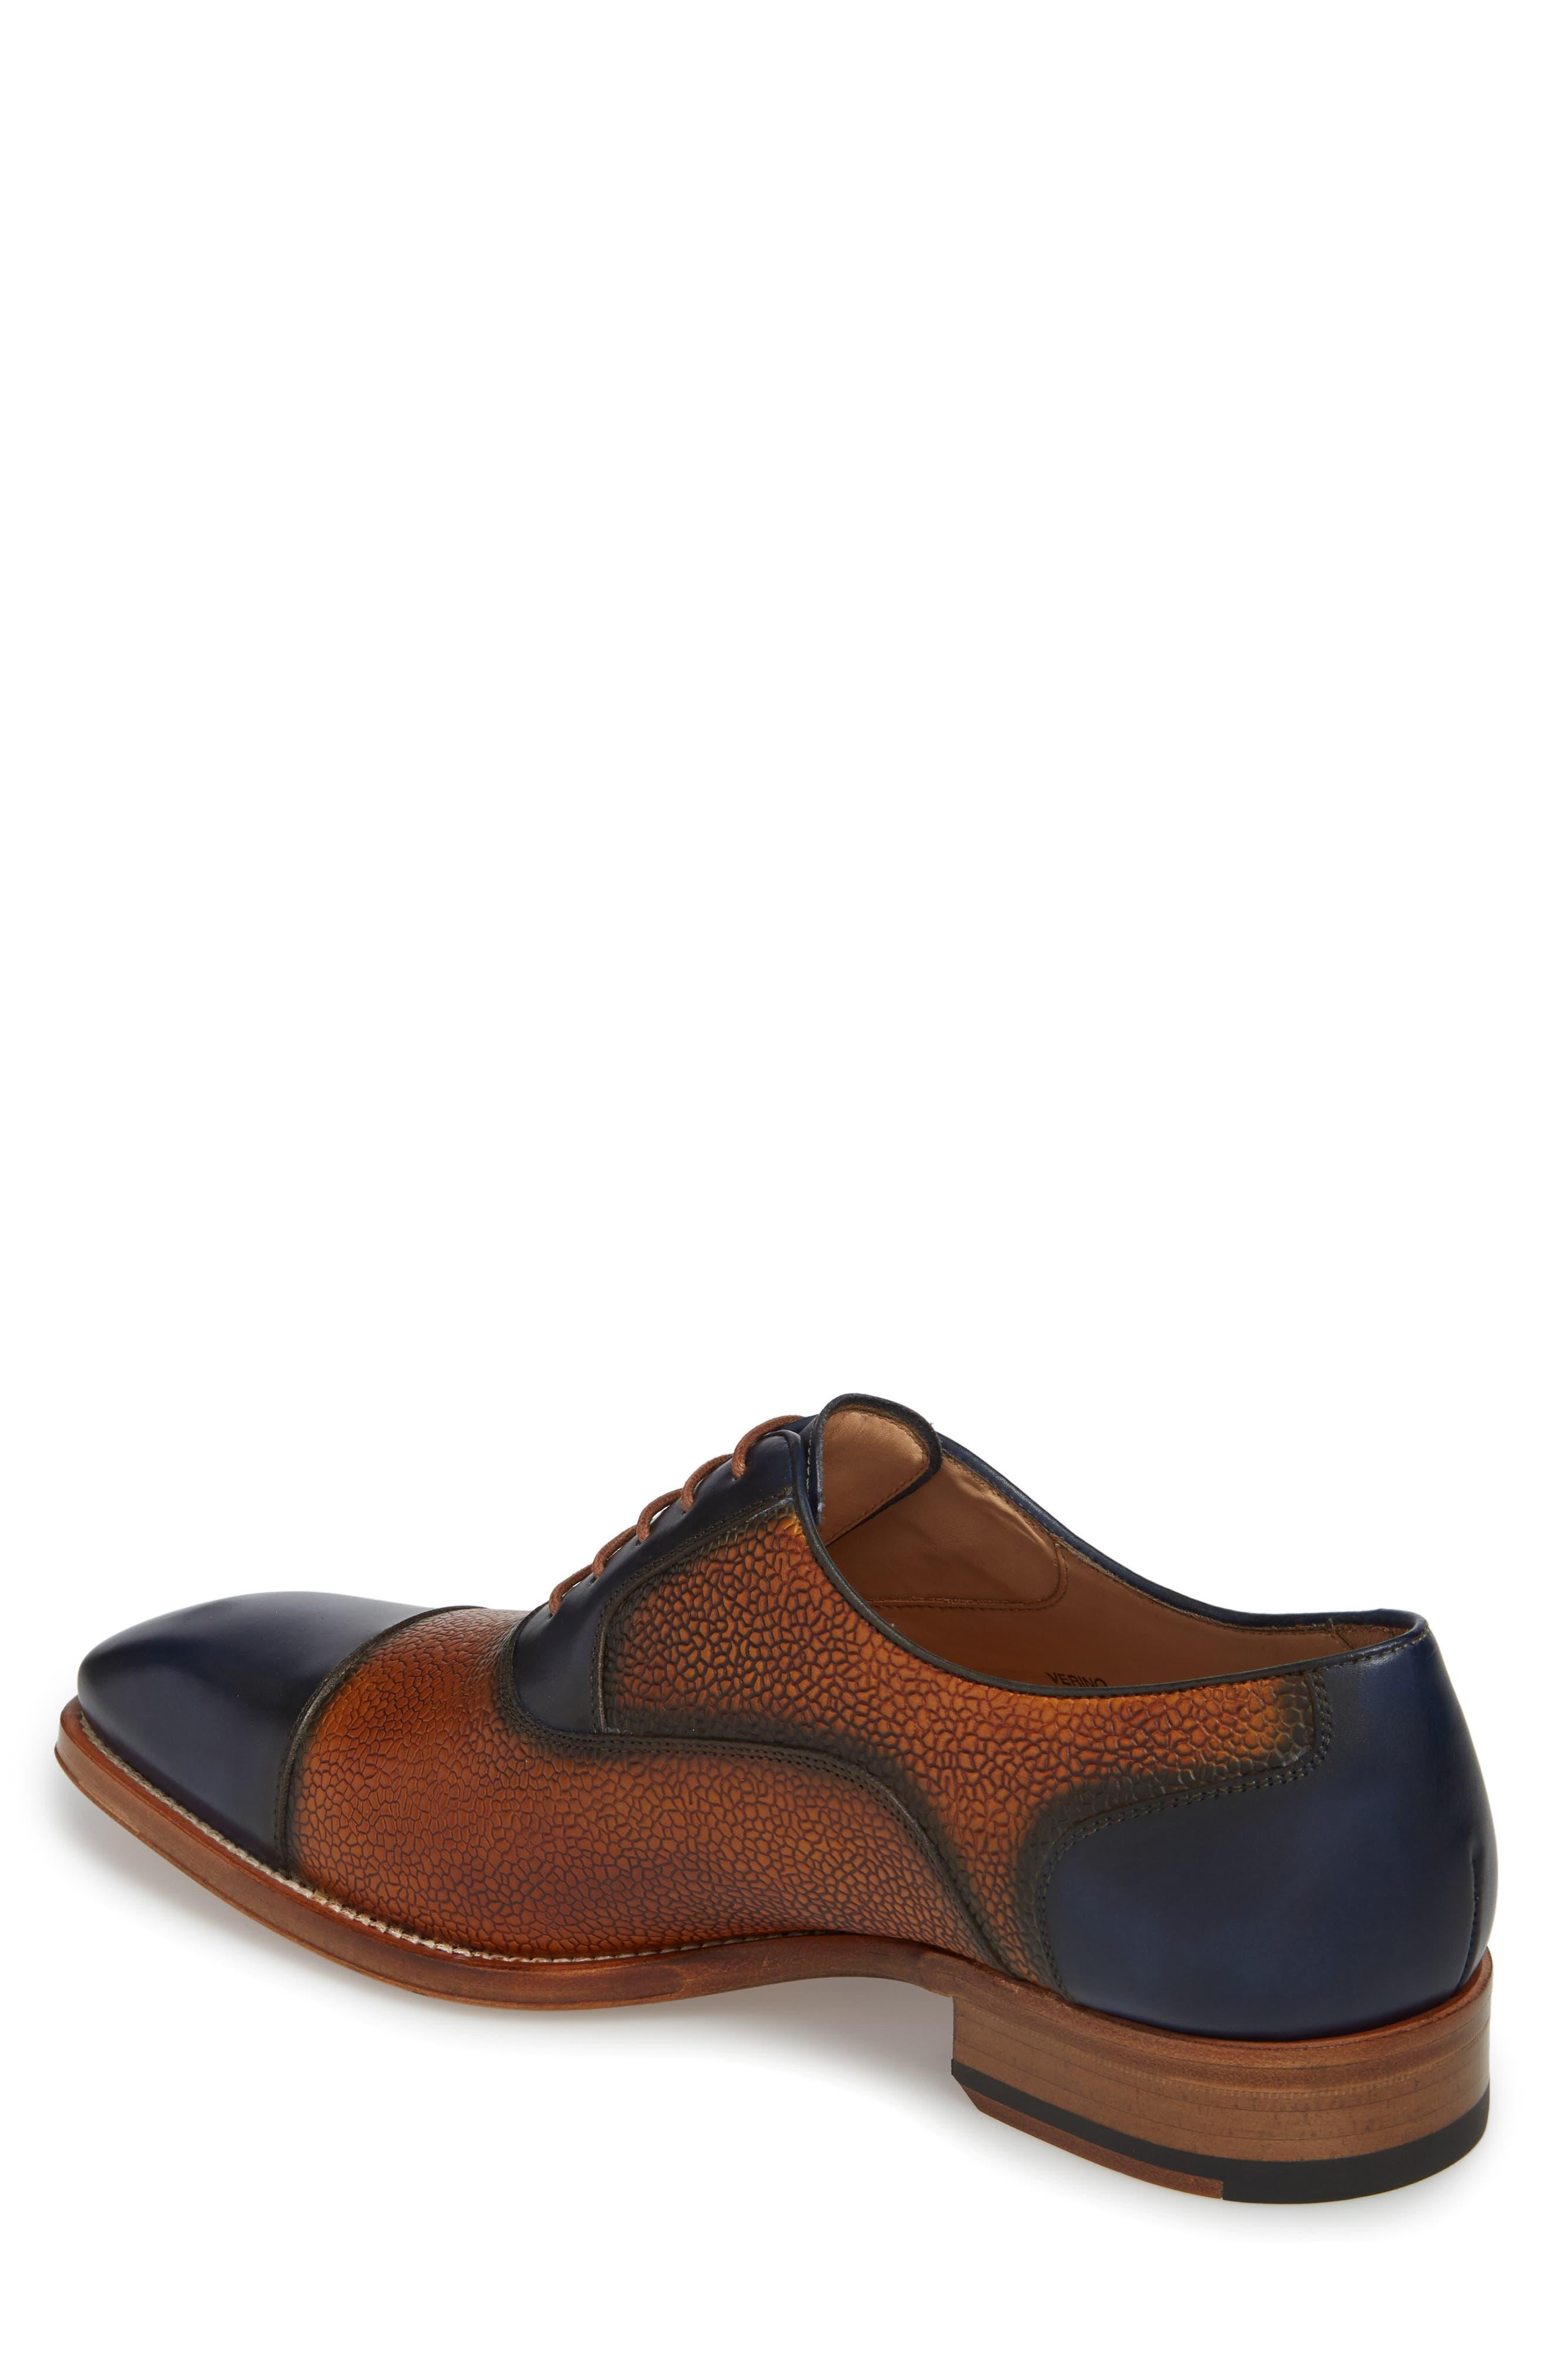 Verino Cap Toe Oxford,                             Alternate thumbnail 2, color,                             Blue/ Tan Leather